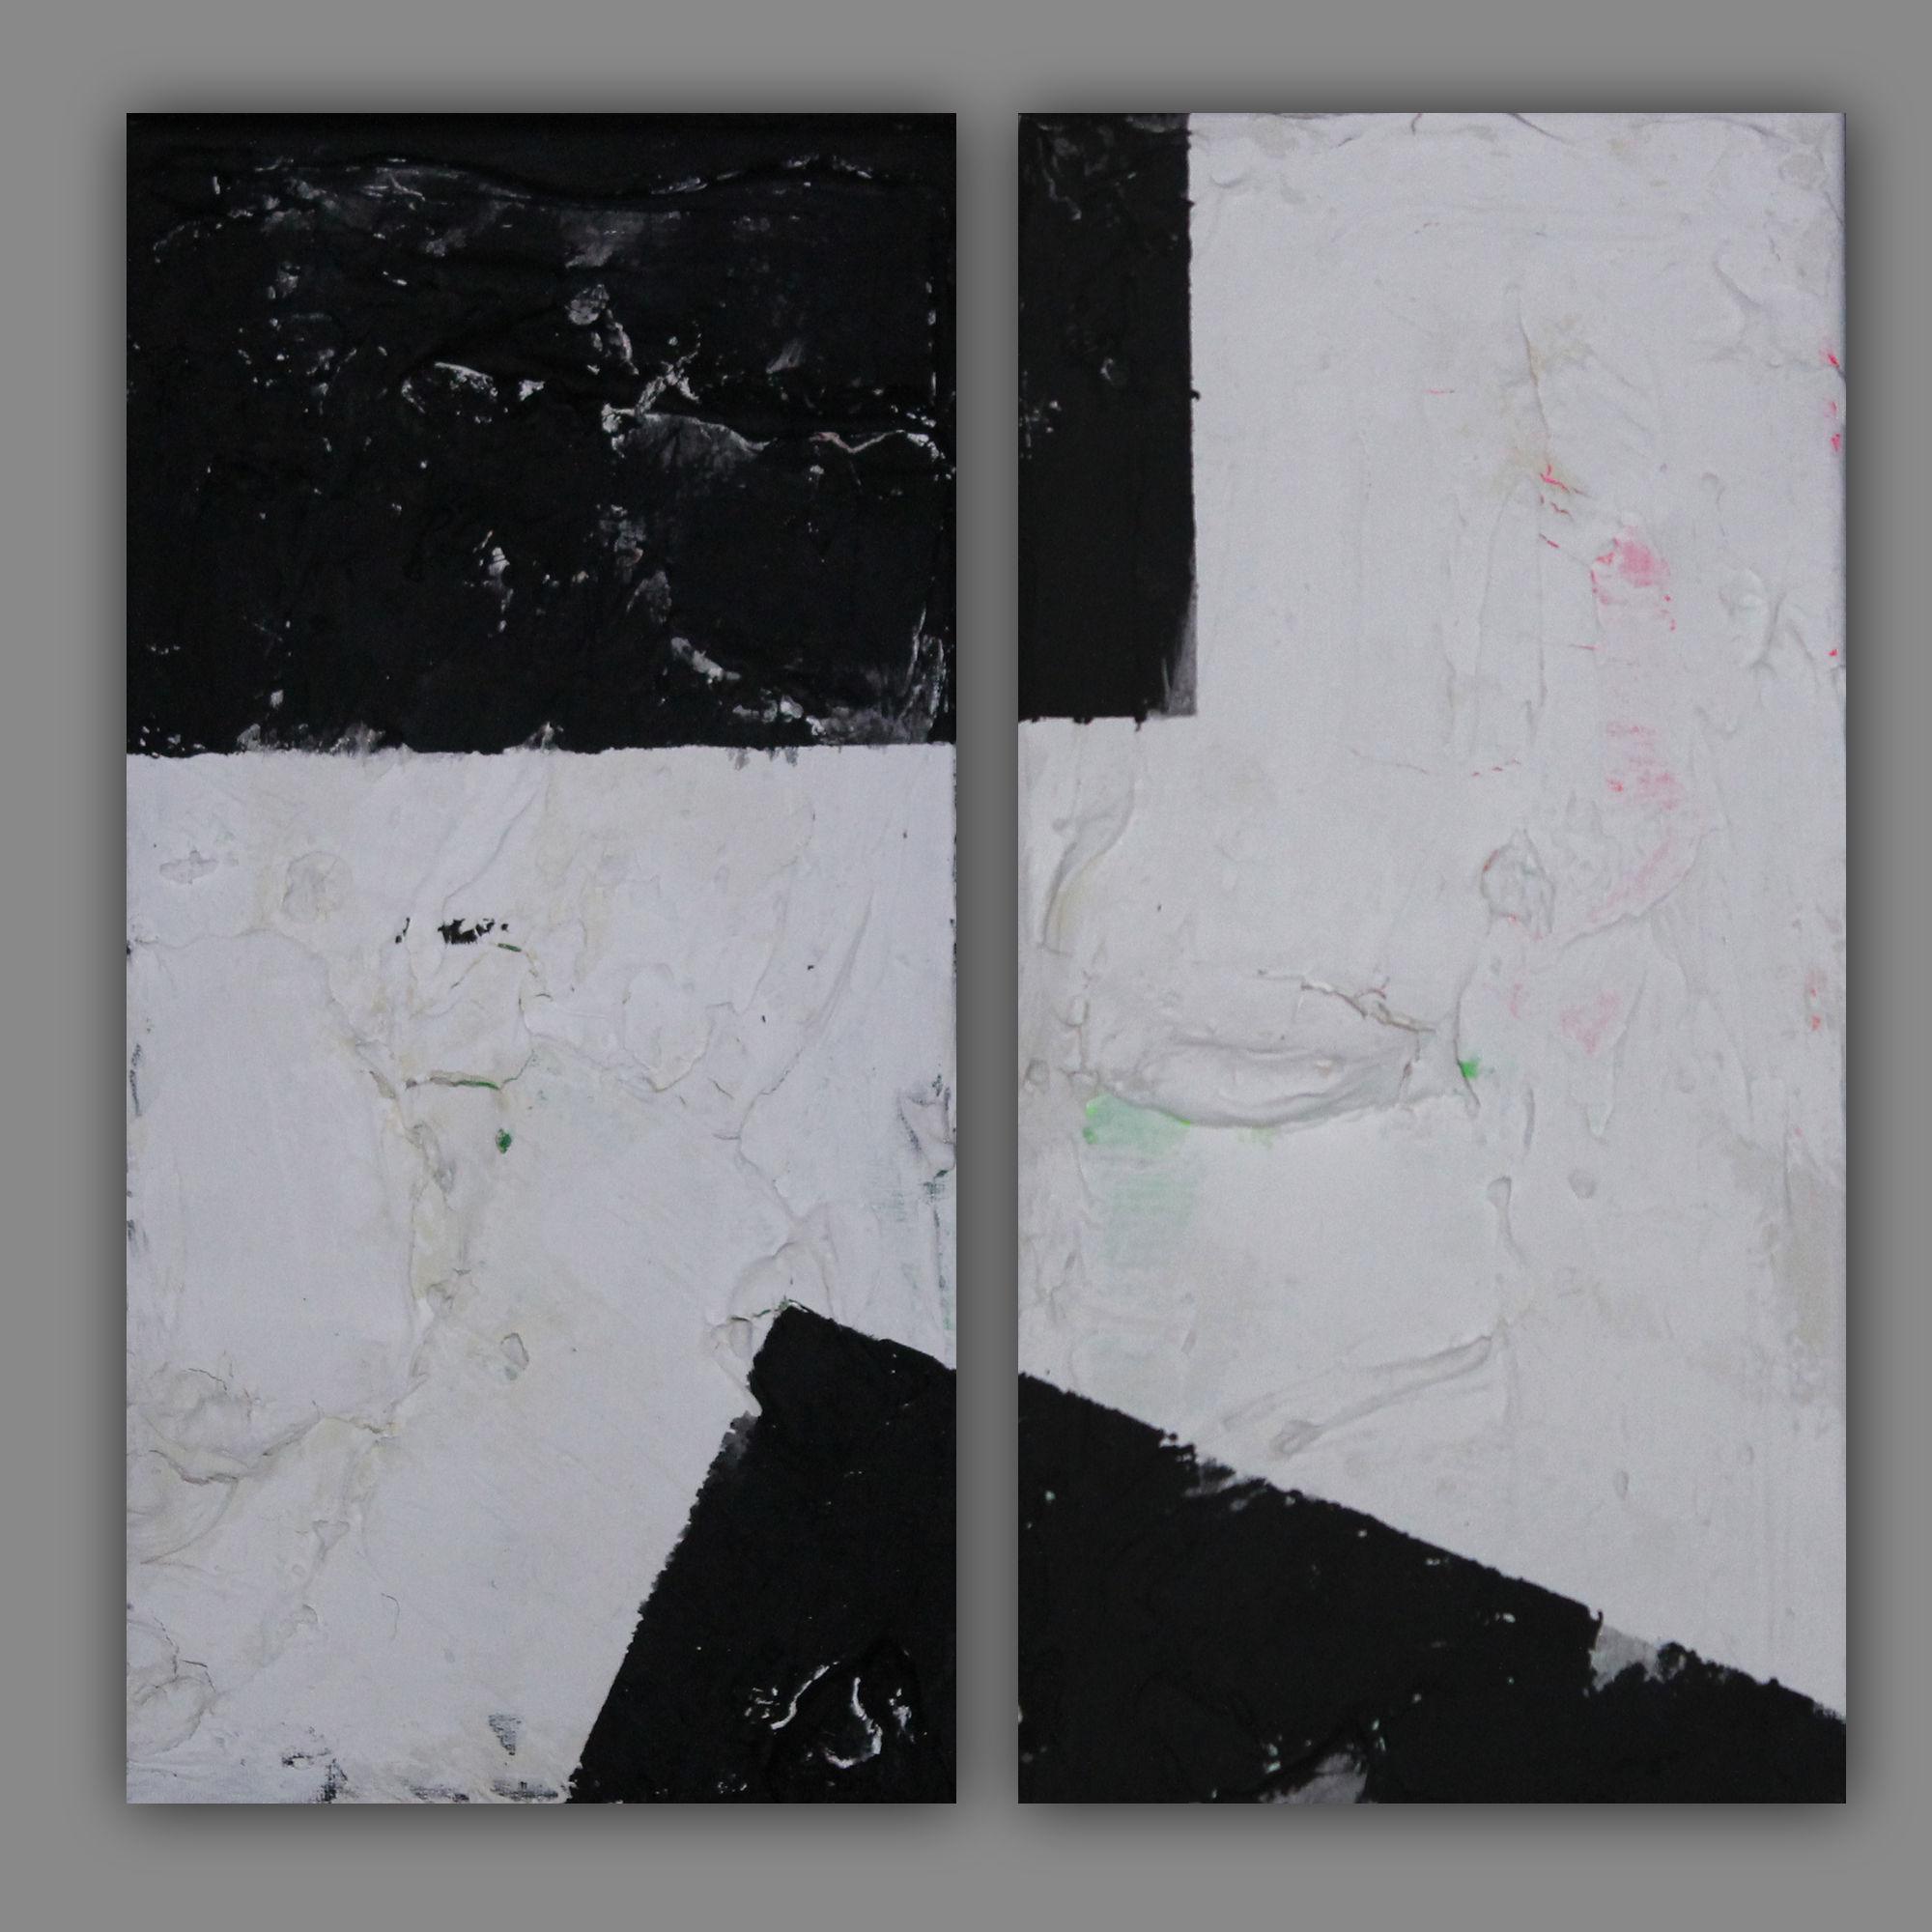 Untitled II, 2018